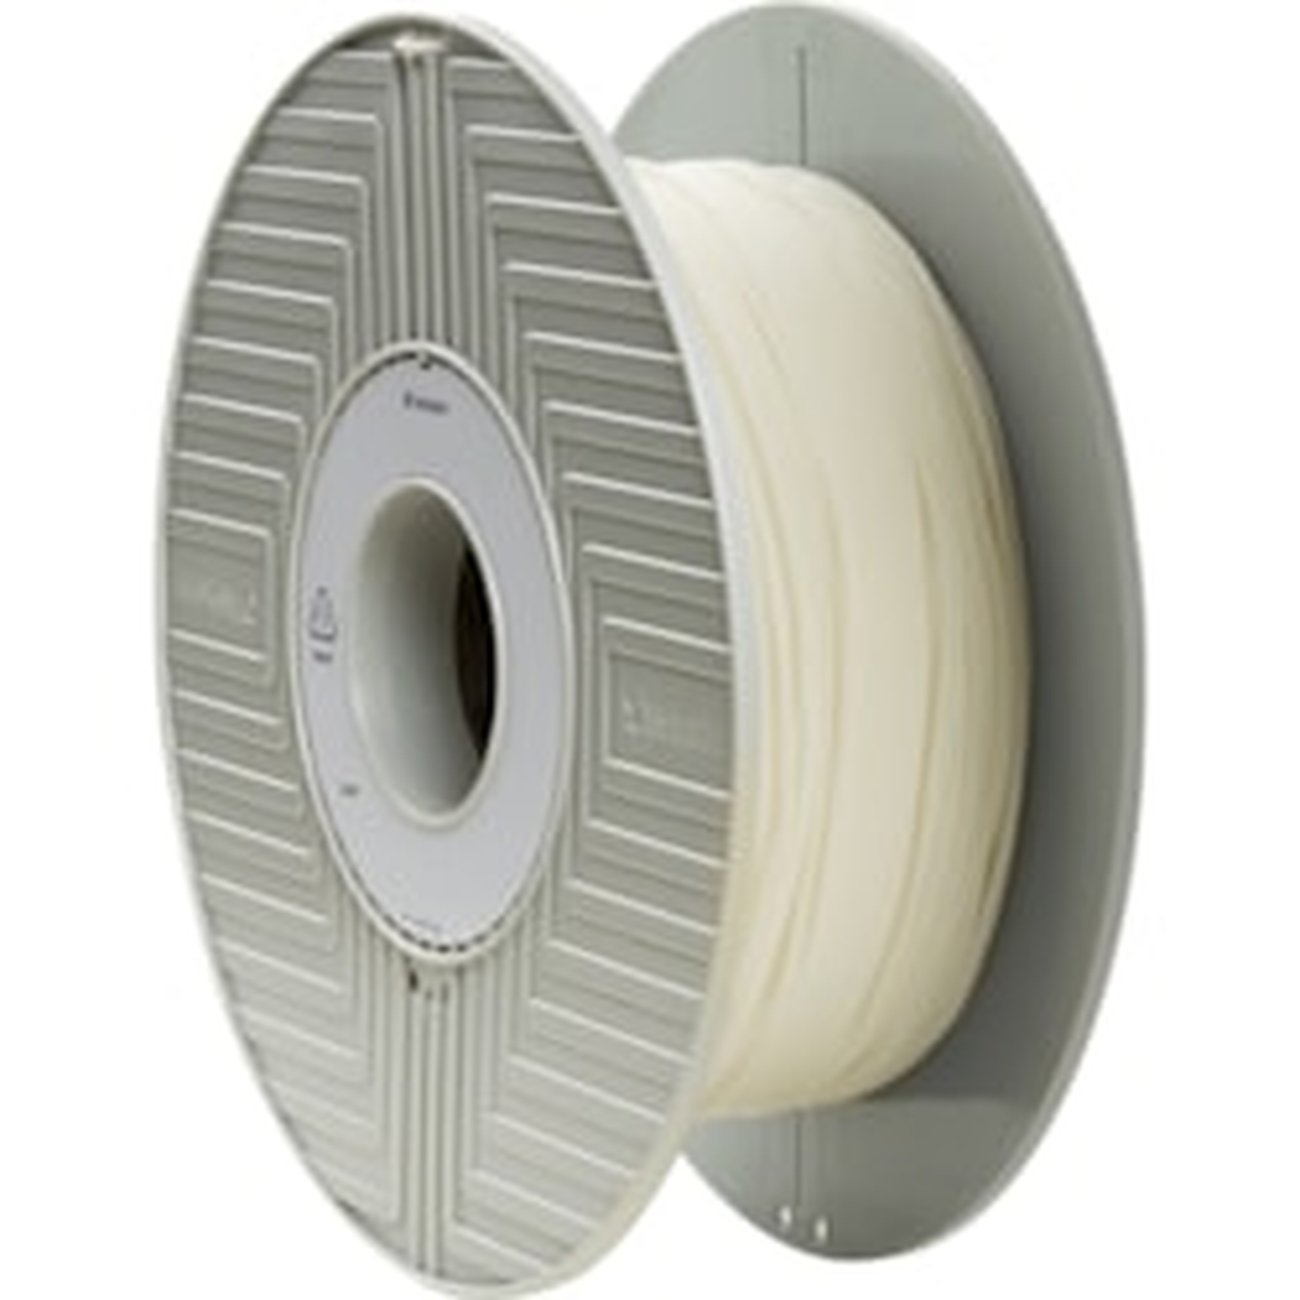 Verbatim PRIMALLOY 3D Printer ABS Filament